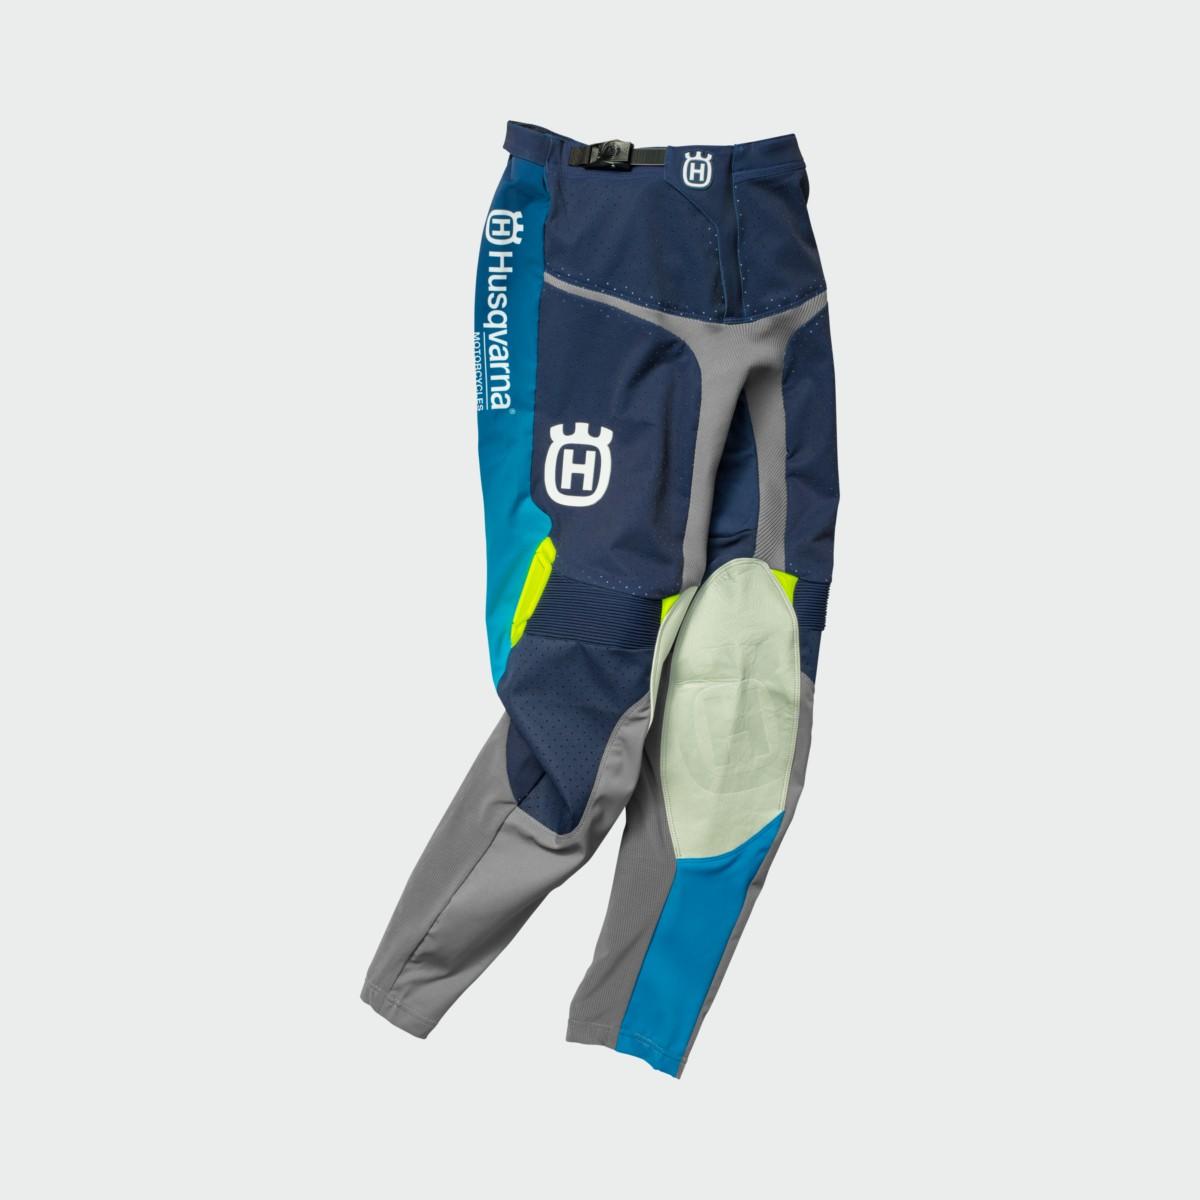 Spodnie crossowe HUSQVARNA GOTLAND PANTS